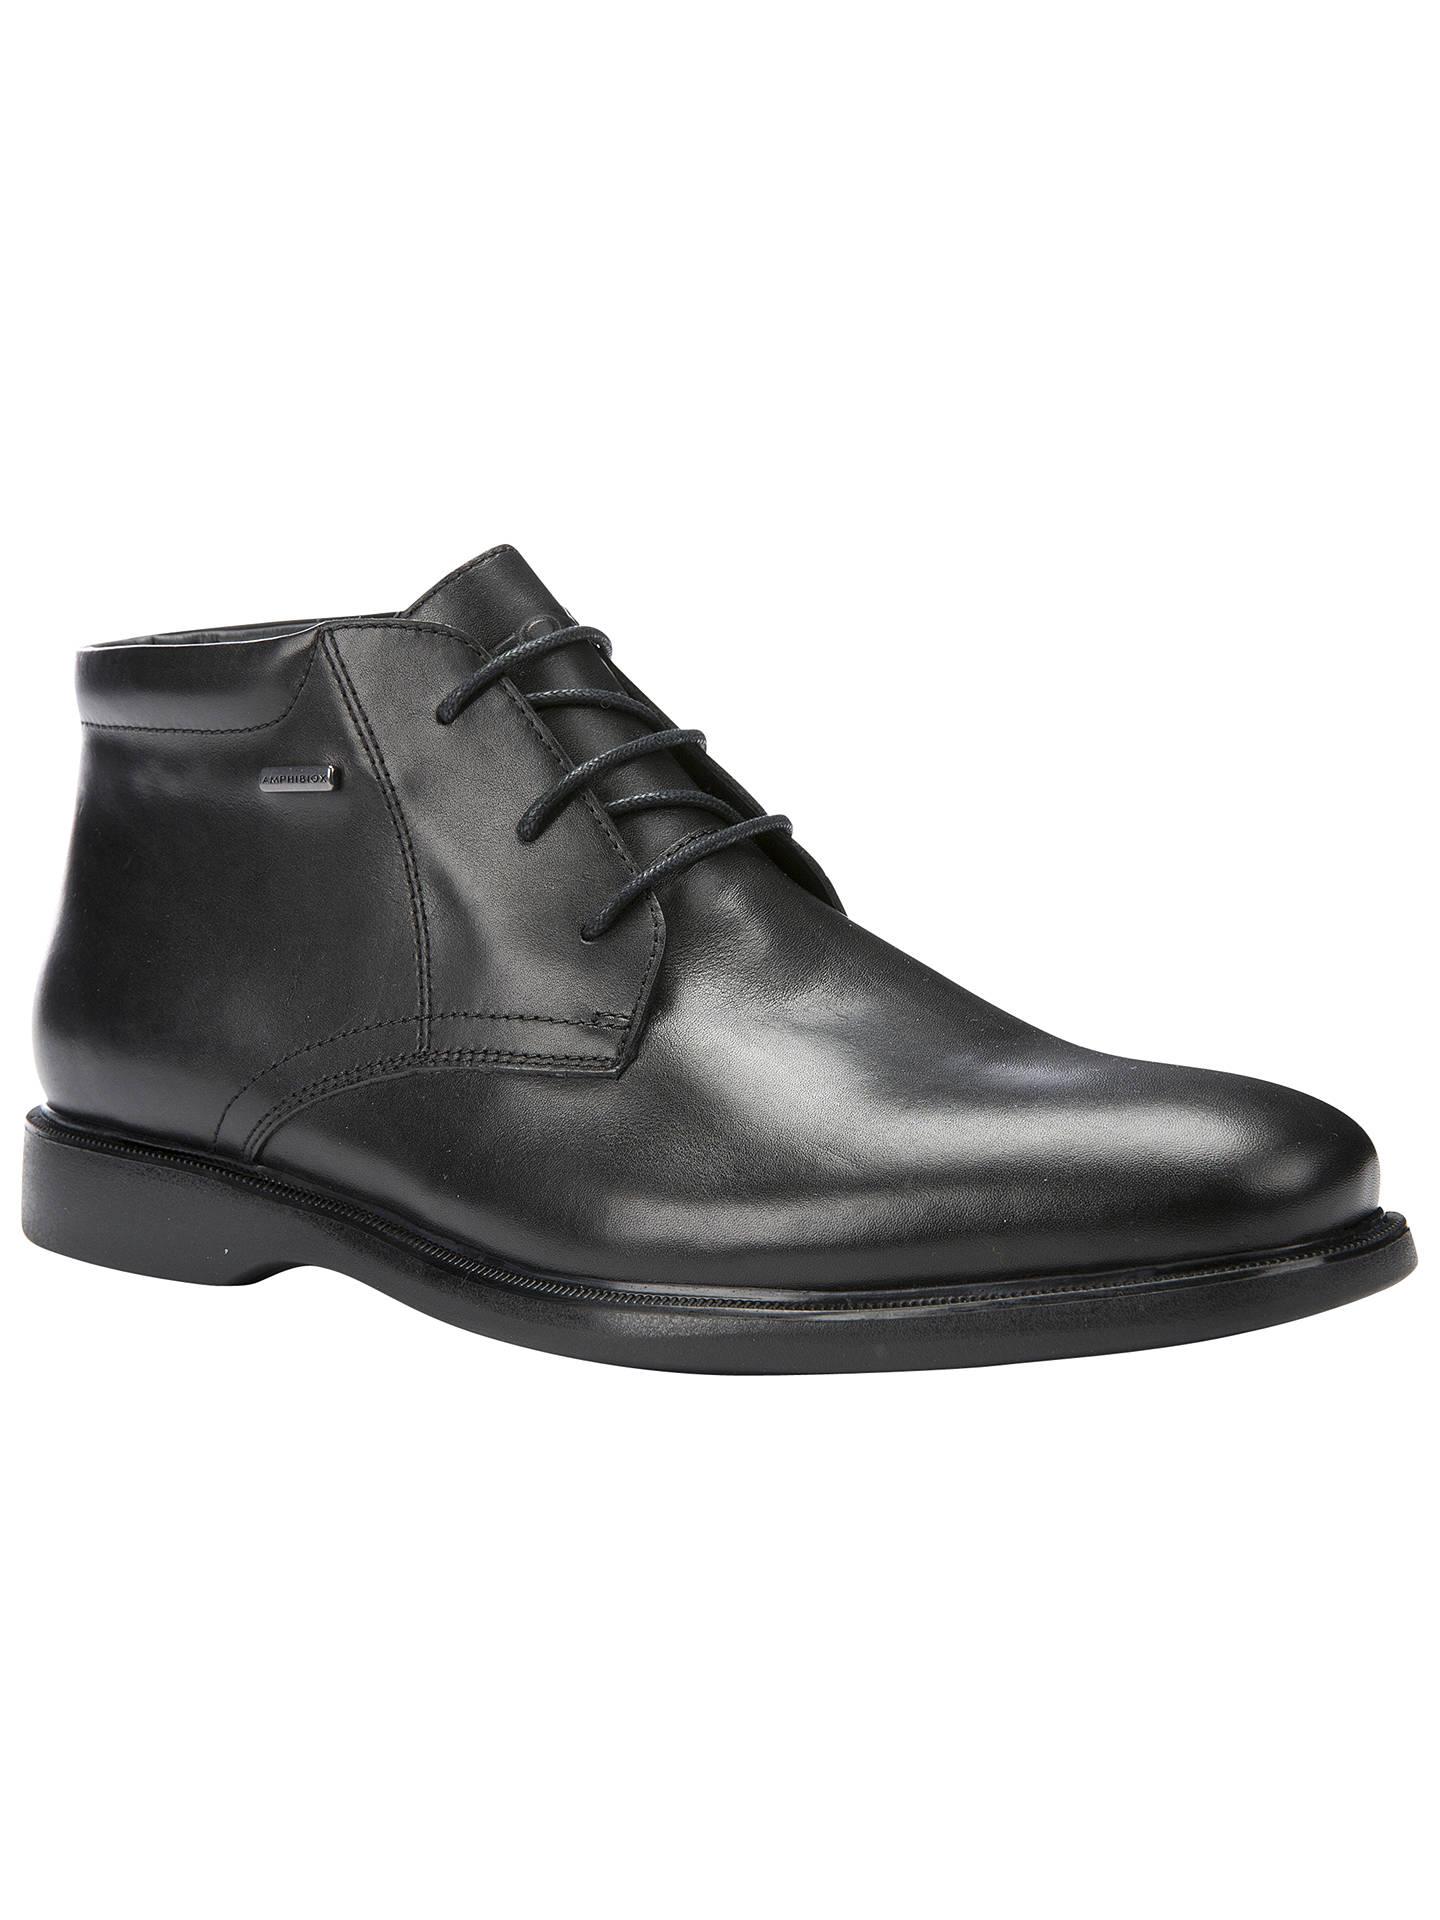 d9bbccba38 Buy Geox Brayden Amphibiox Waterproof Leather Chukka Boots, Black, 7 Online  at johnlewis.